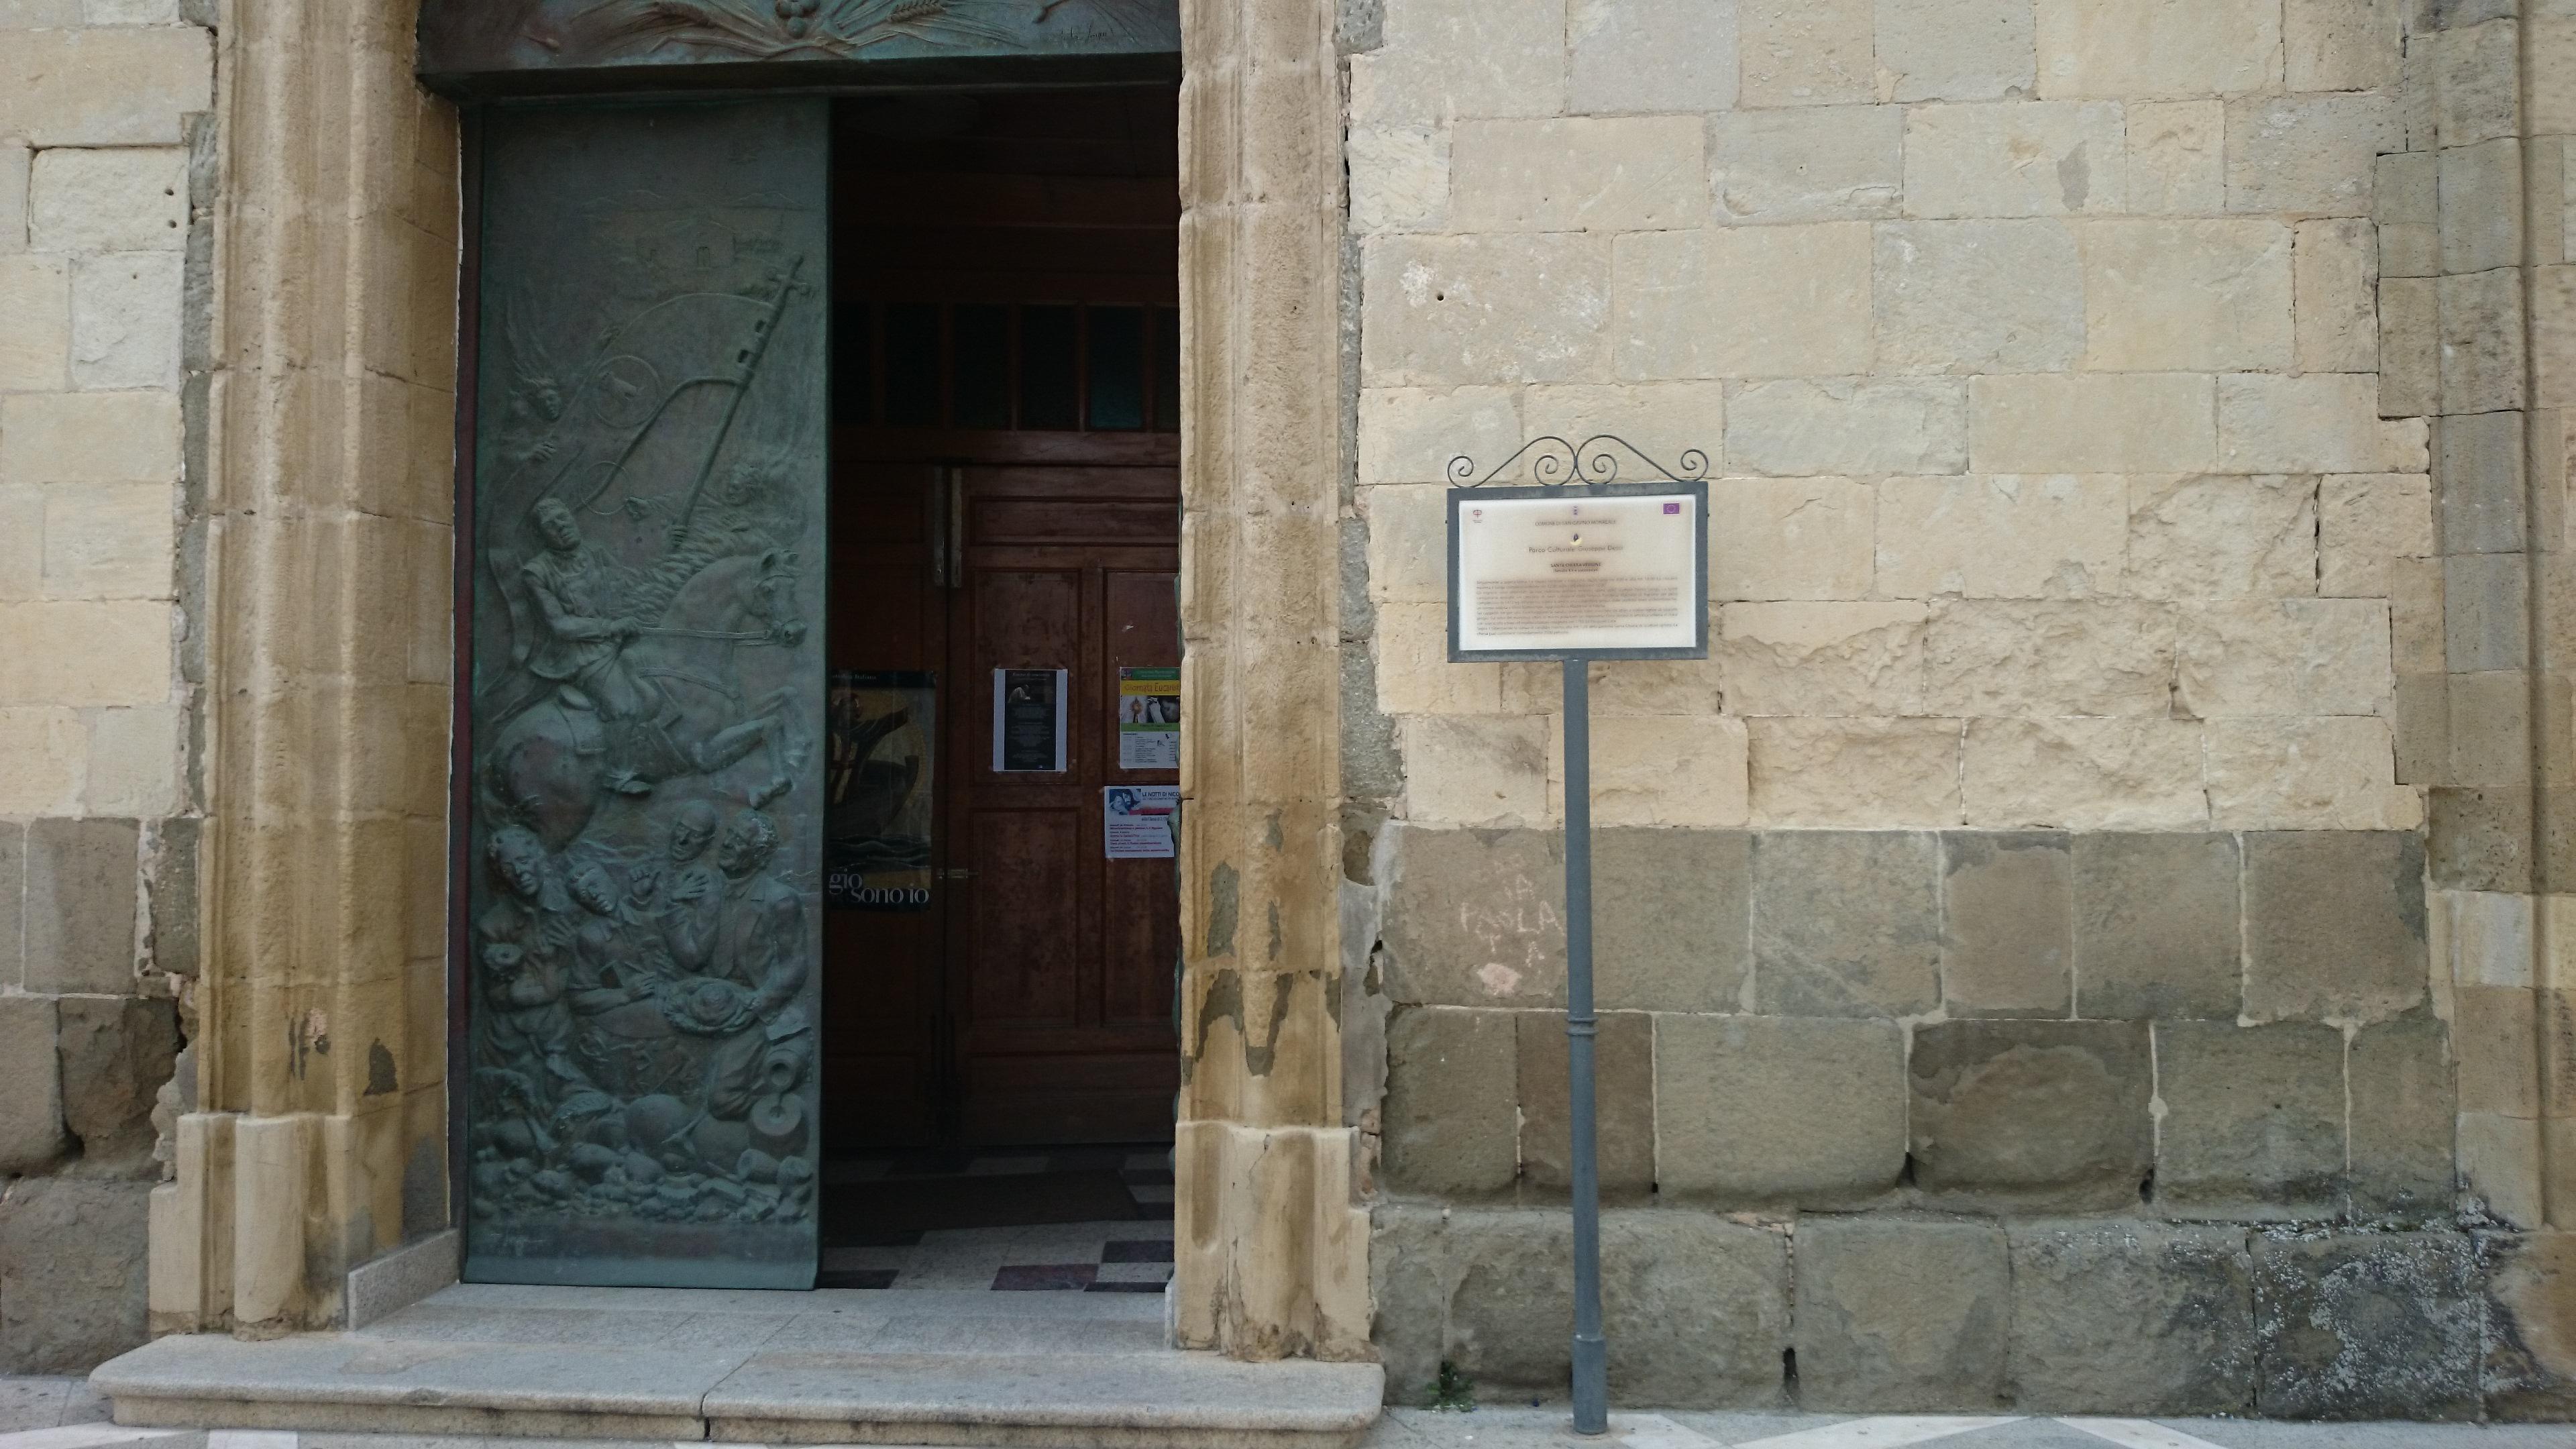 La chiesa di Santa Chiara